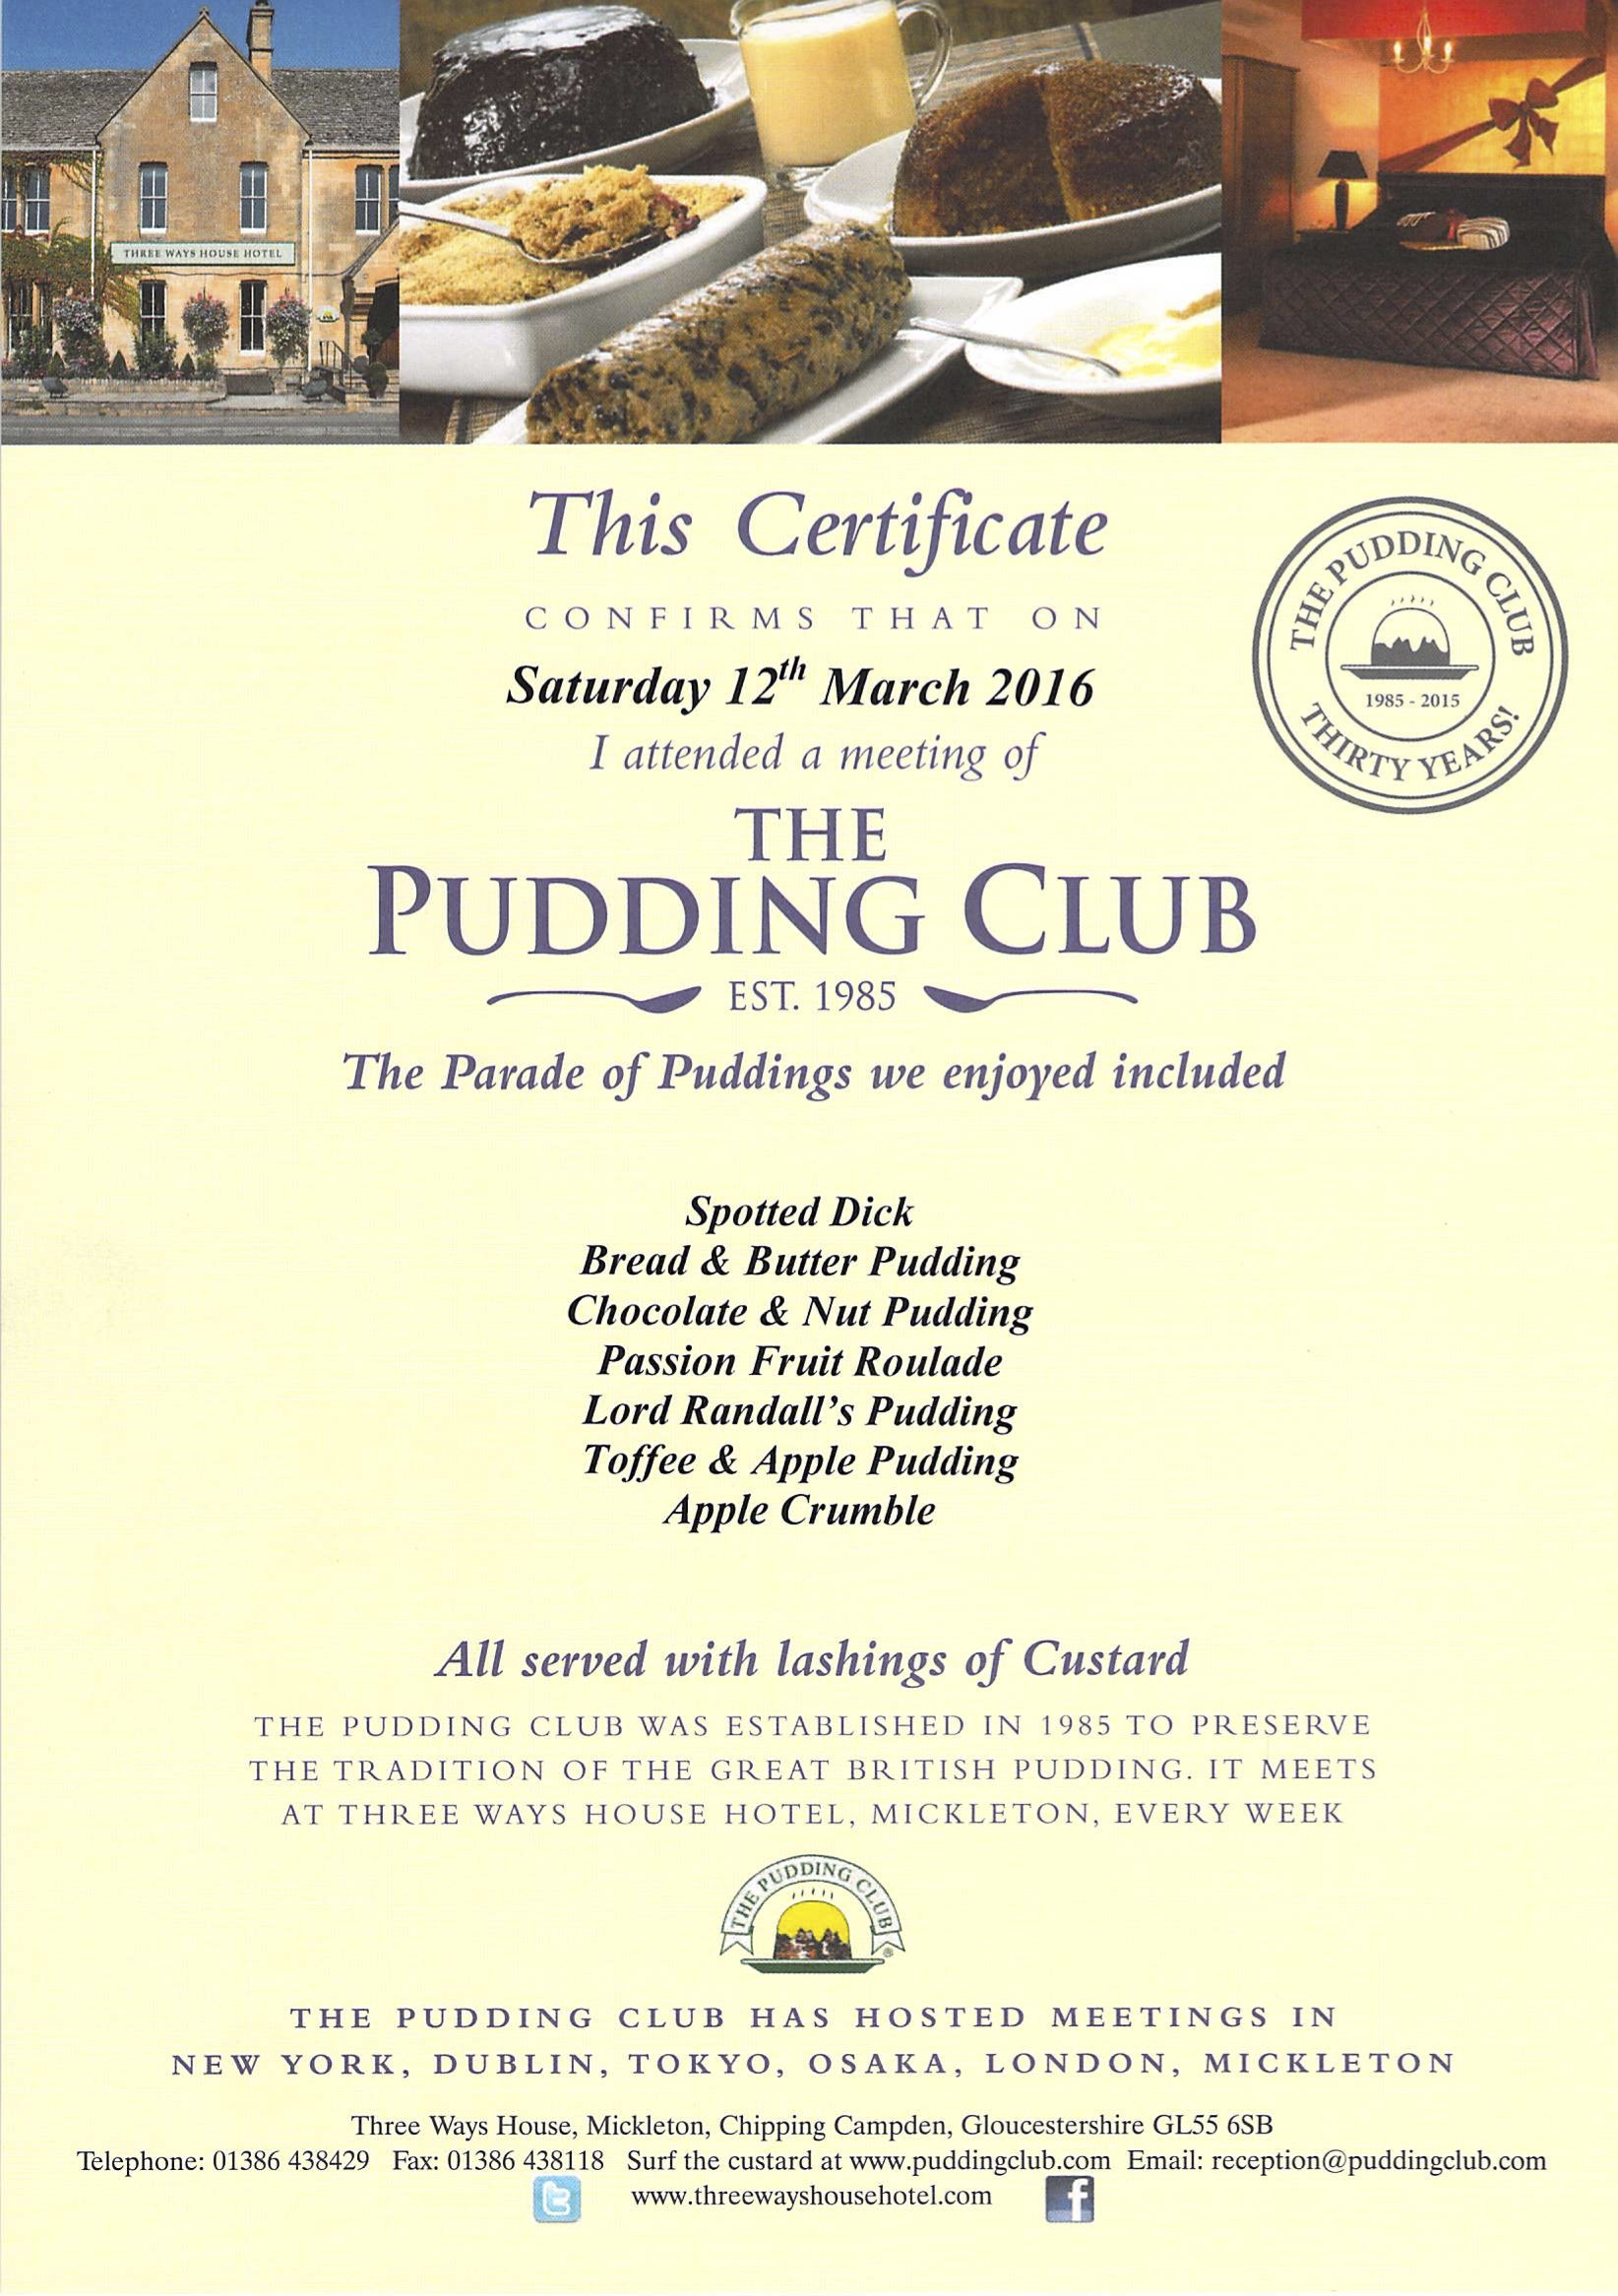 Each guest receives a certificate